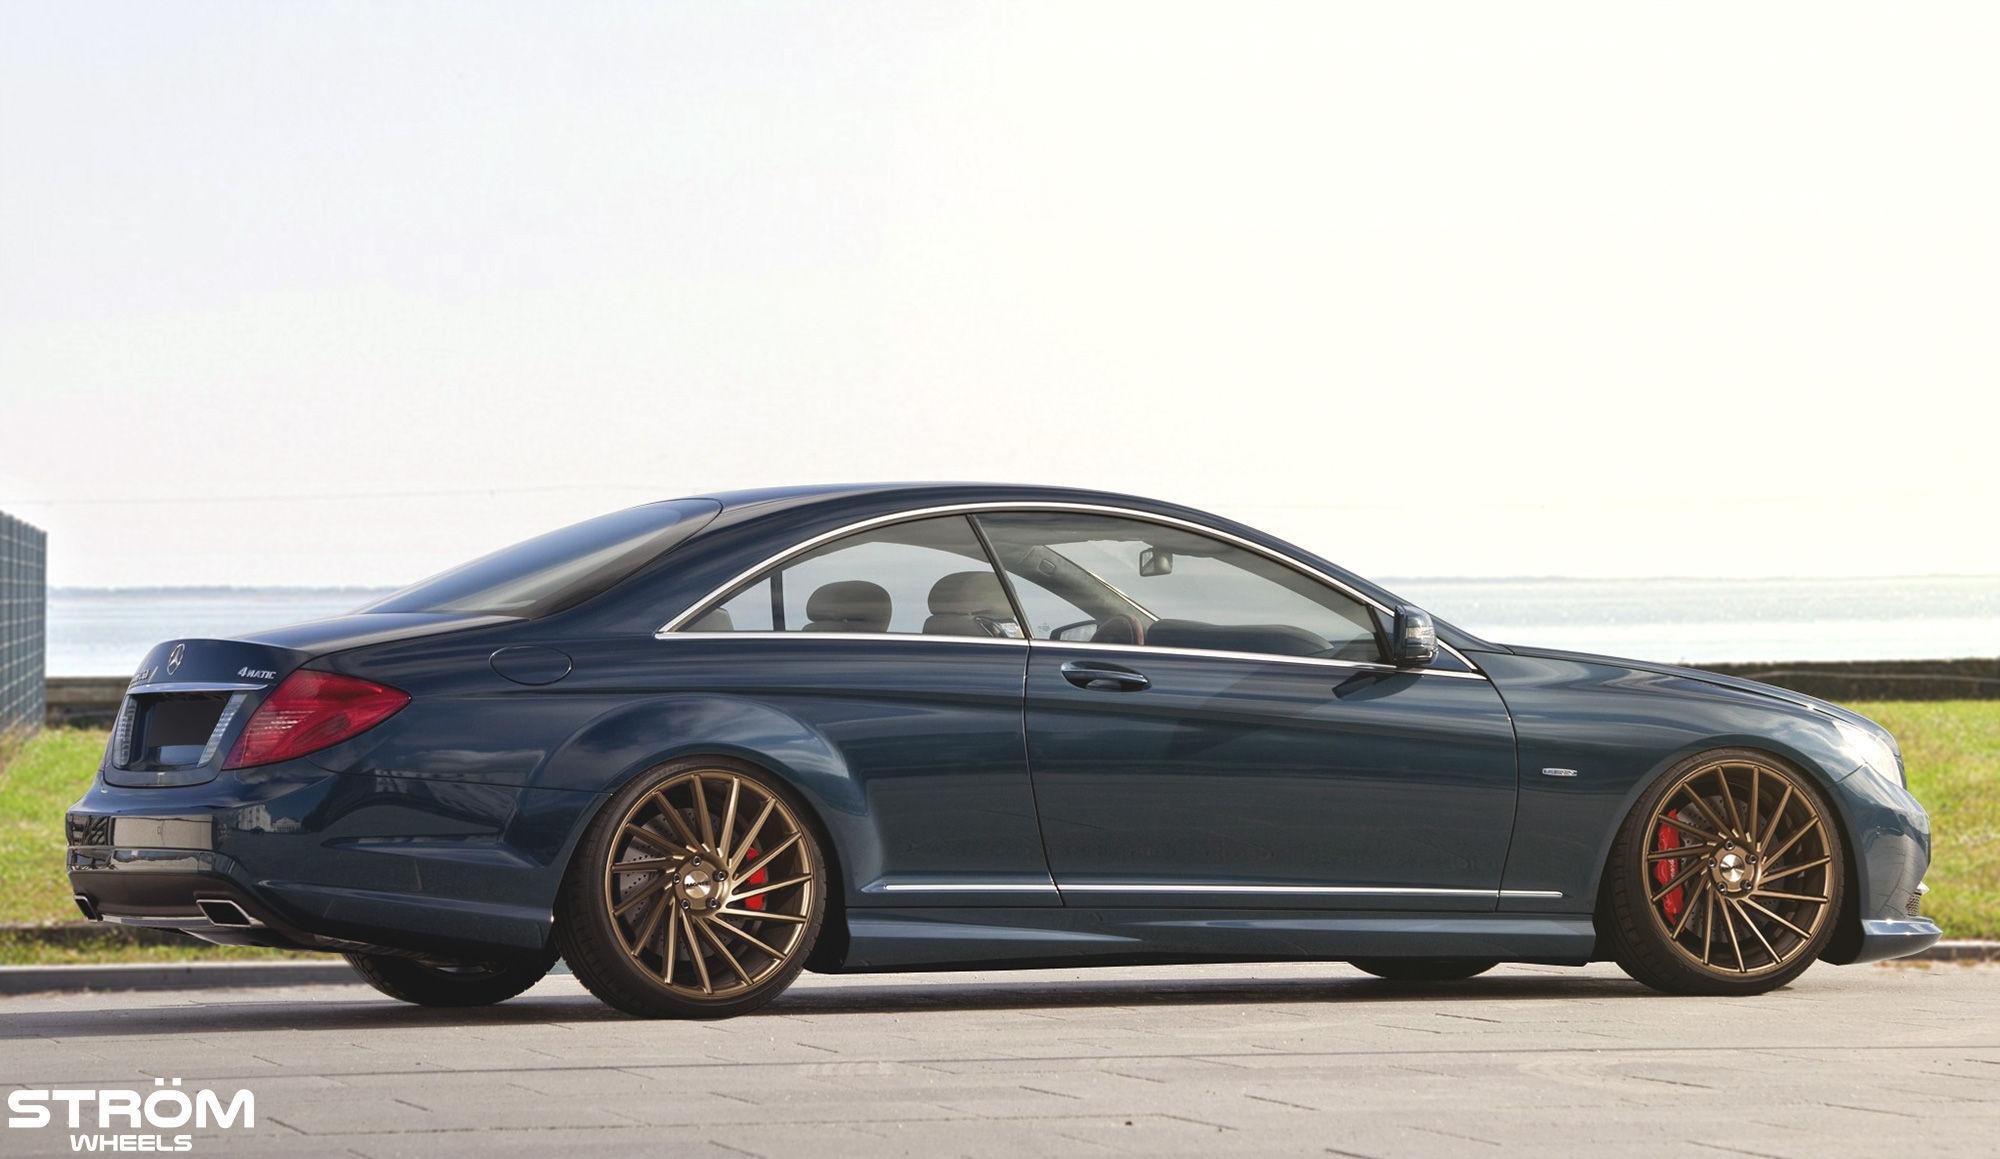 Mercedes-Benz CL-Class | Strom DS15 - Mercedes Benz CL500 AMG sports package